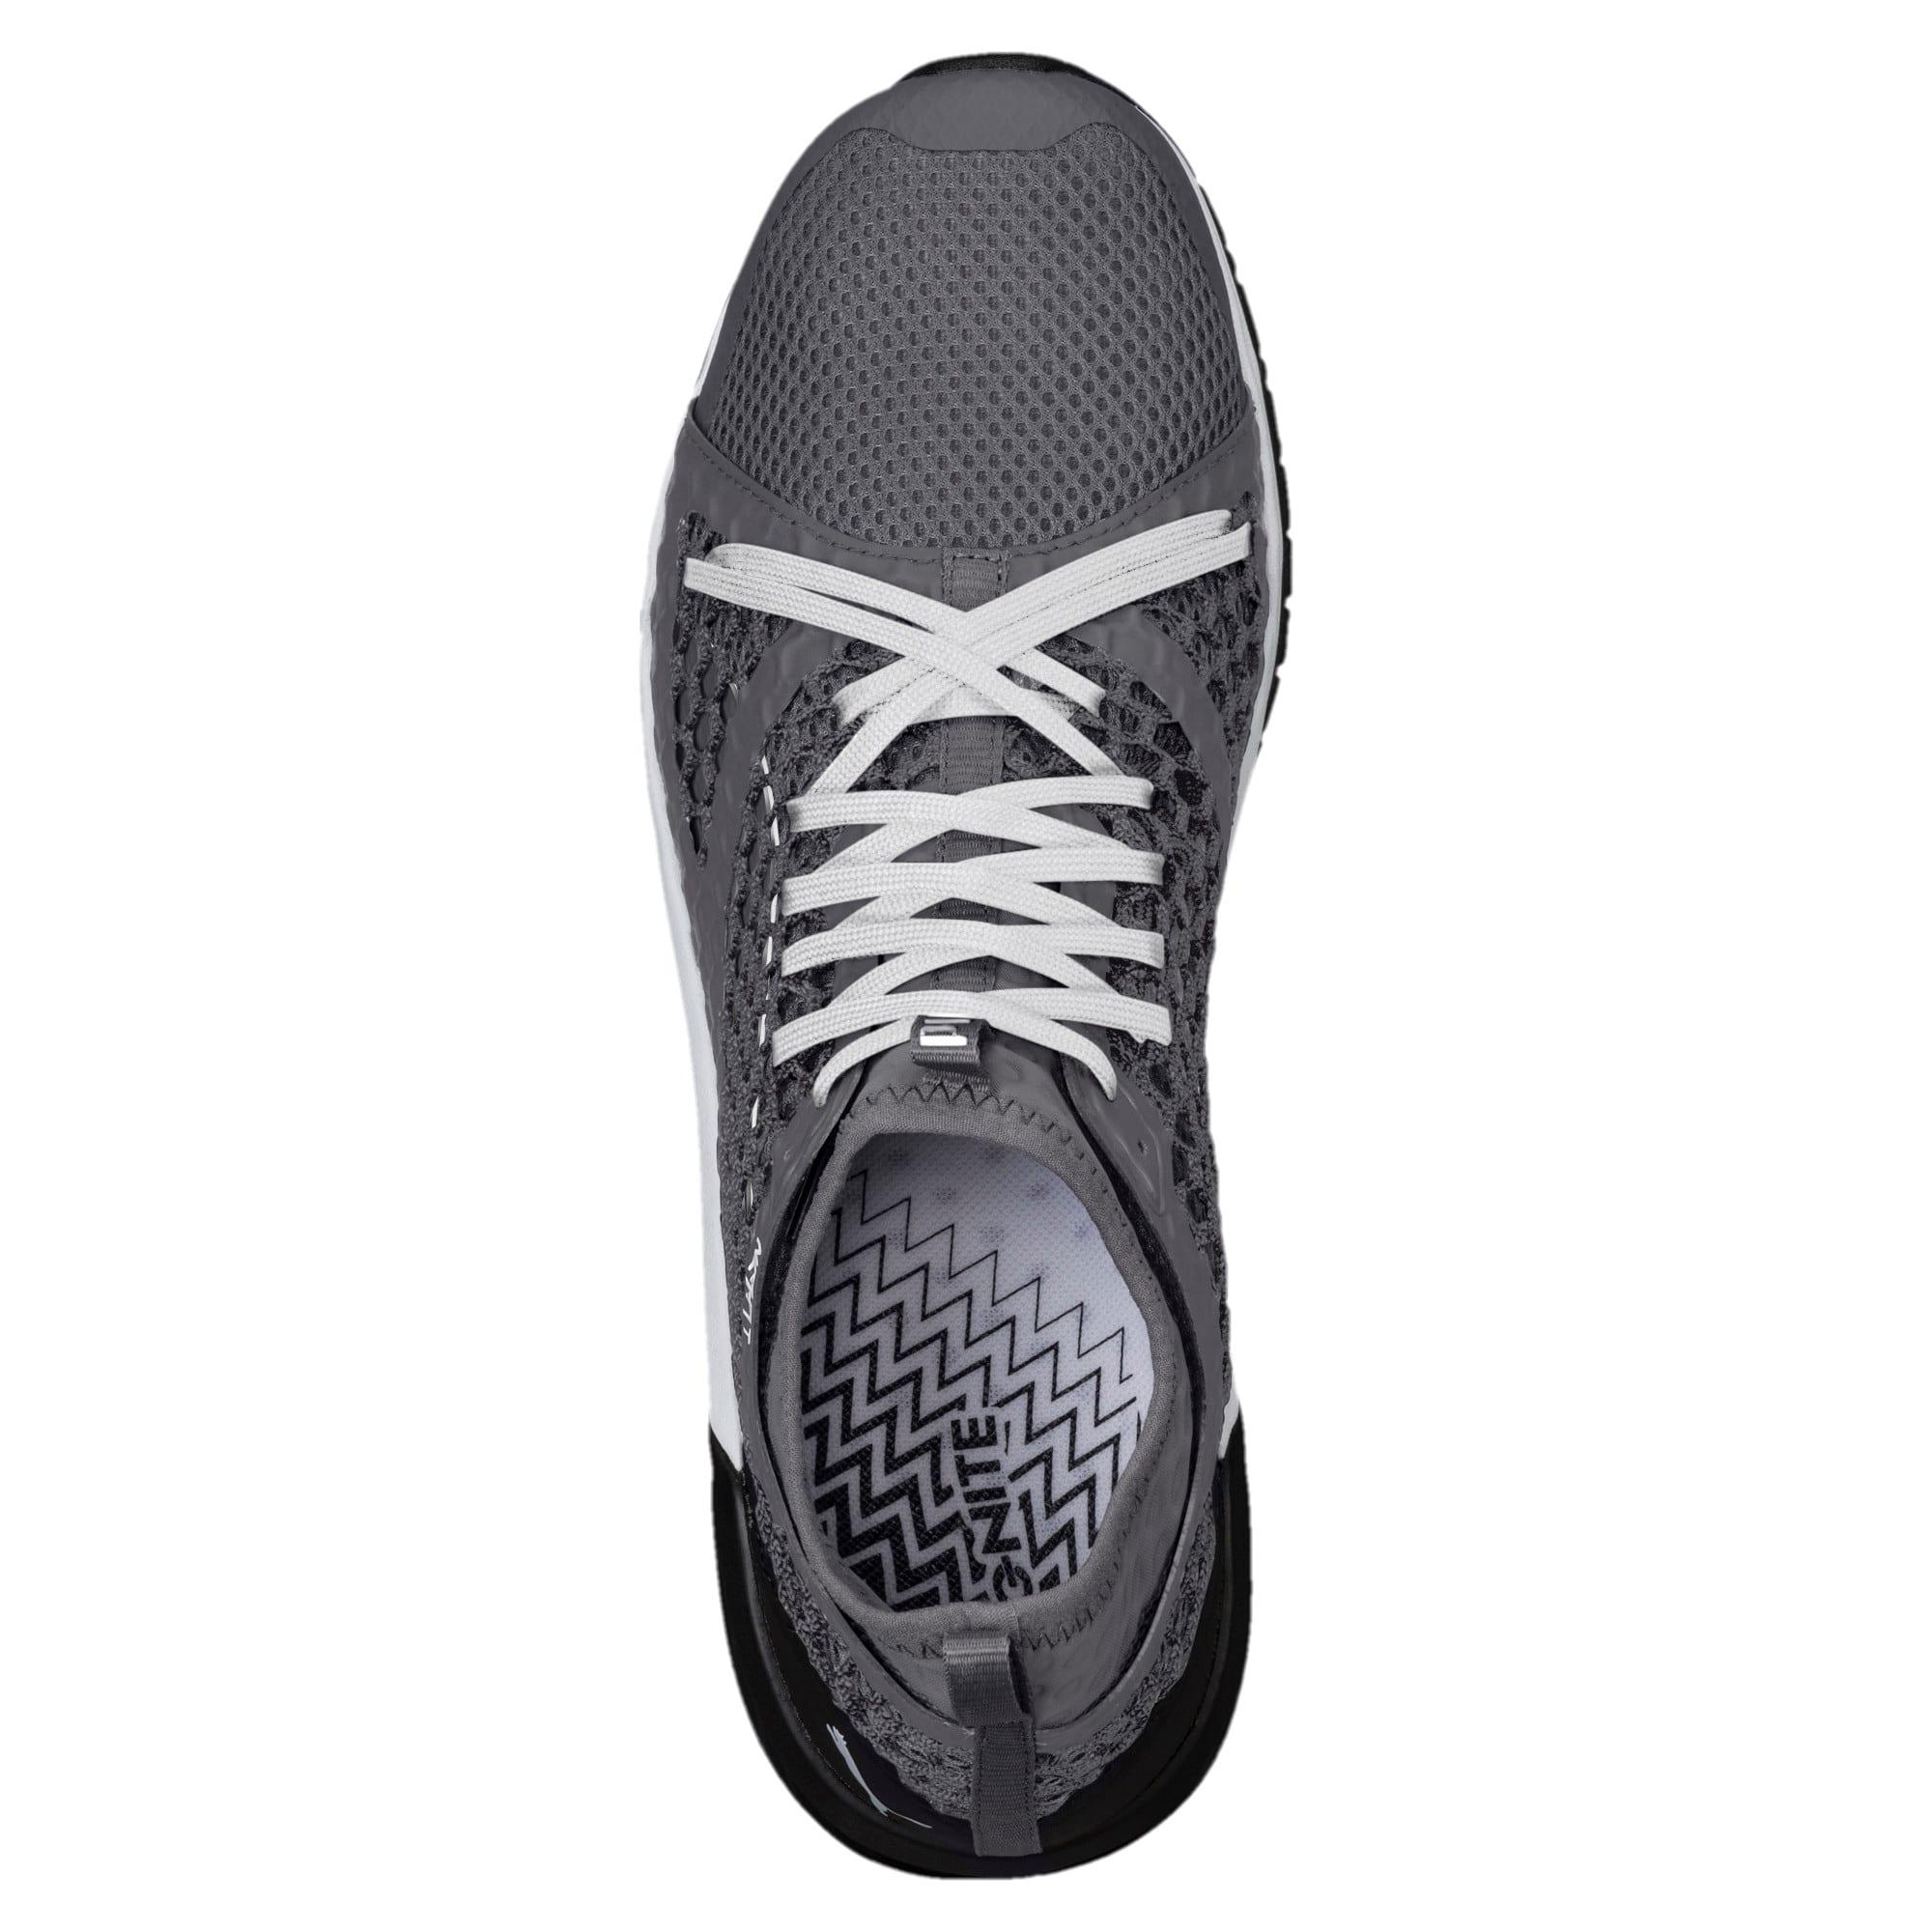 Thumbnail 5 of IGNITE XT NETFIT Men's Training Shoes, QUIET SHADE-Puma Black, medium-IND